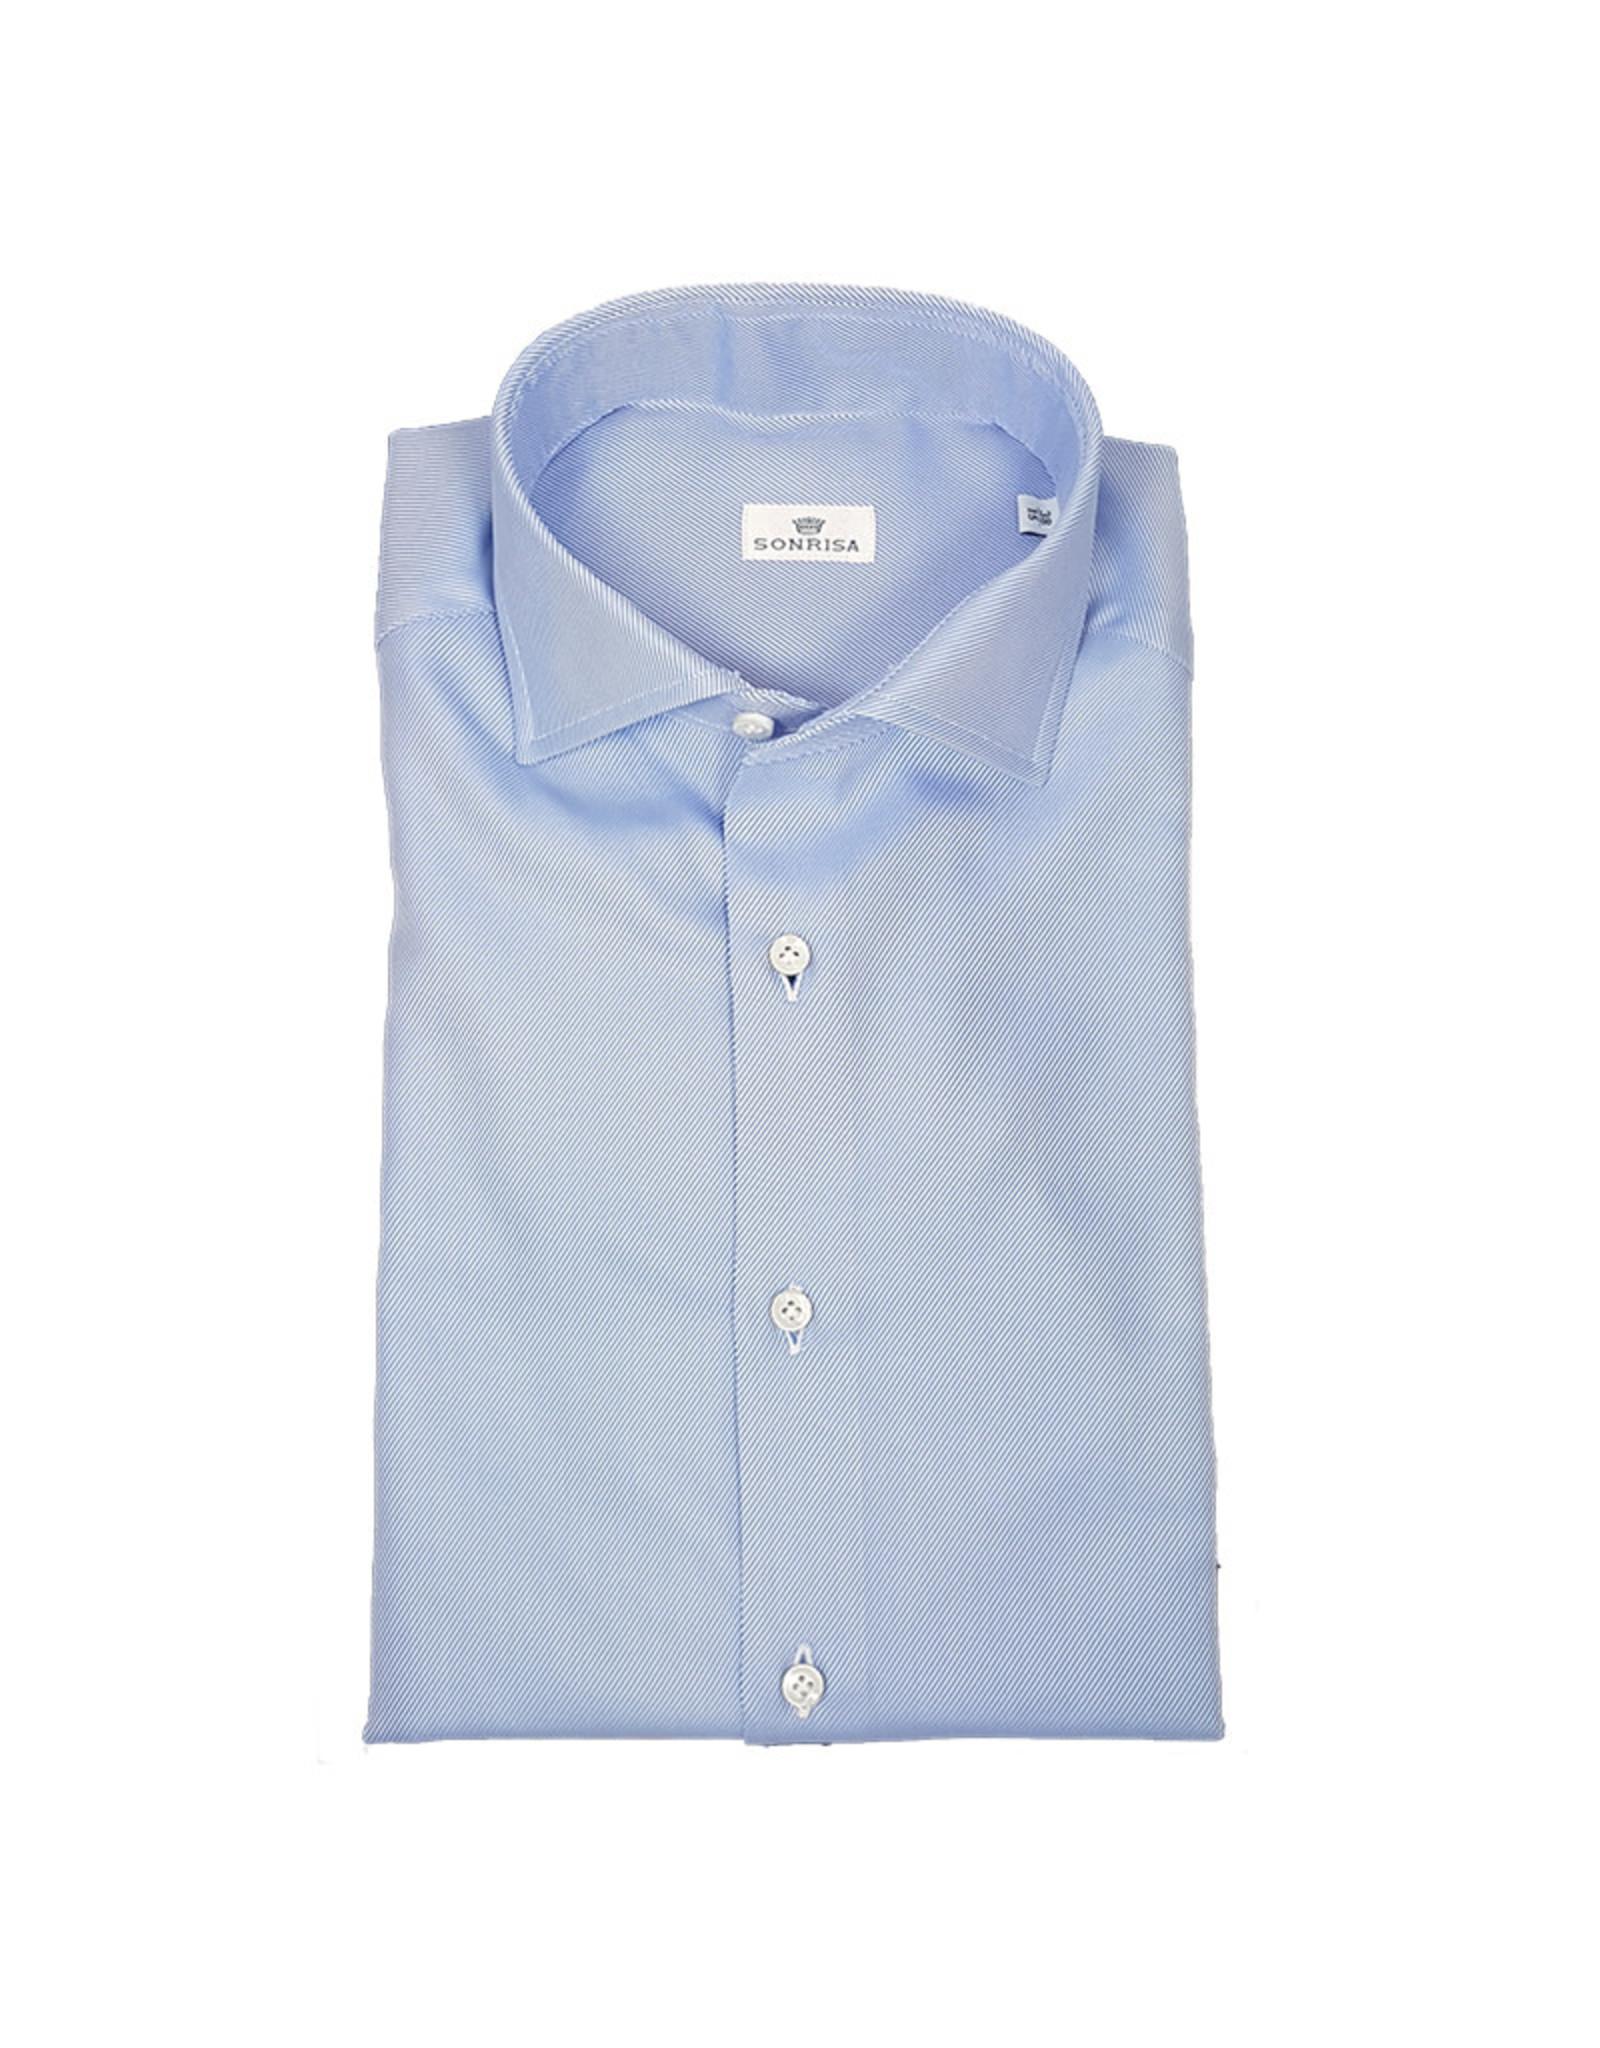 Sonrisa Sonrisa hemd blauw Slimline L1003/02